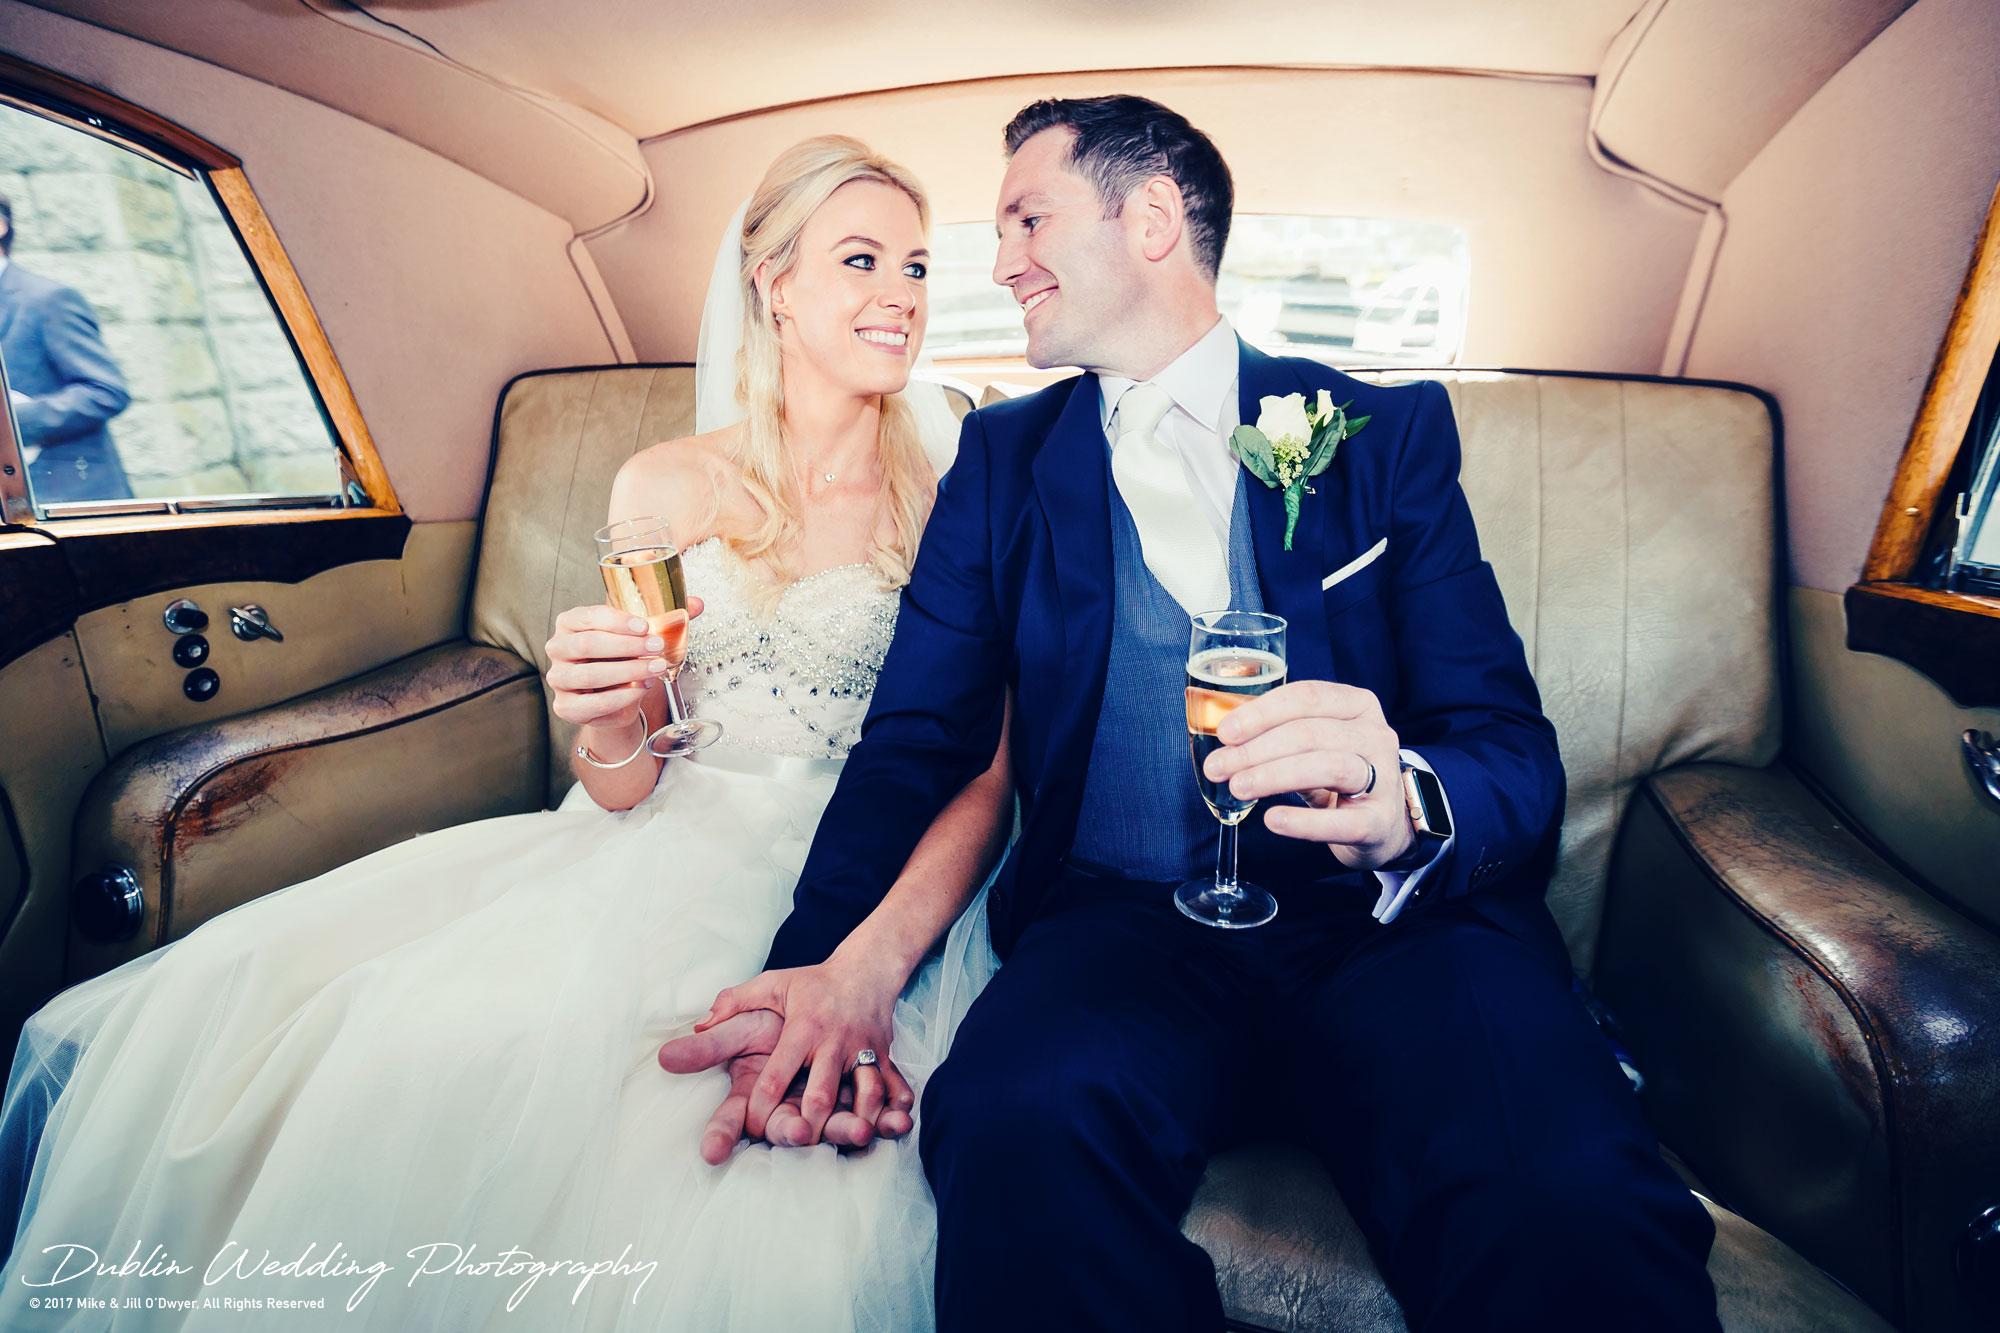 K Club, Kildare, Wedding Photographer, Dublin, Bride and Groom alone at last in the car outside church